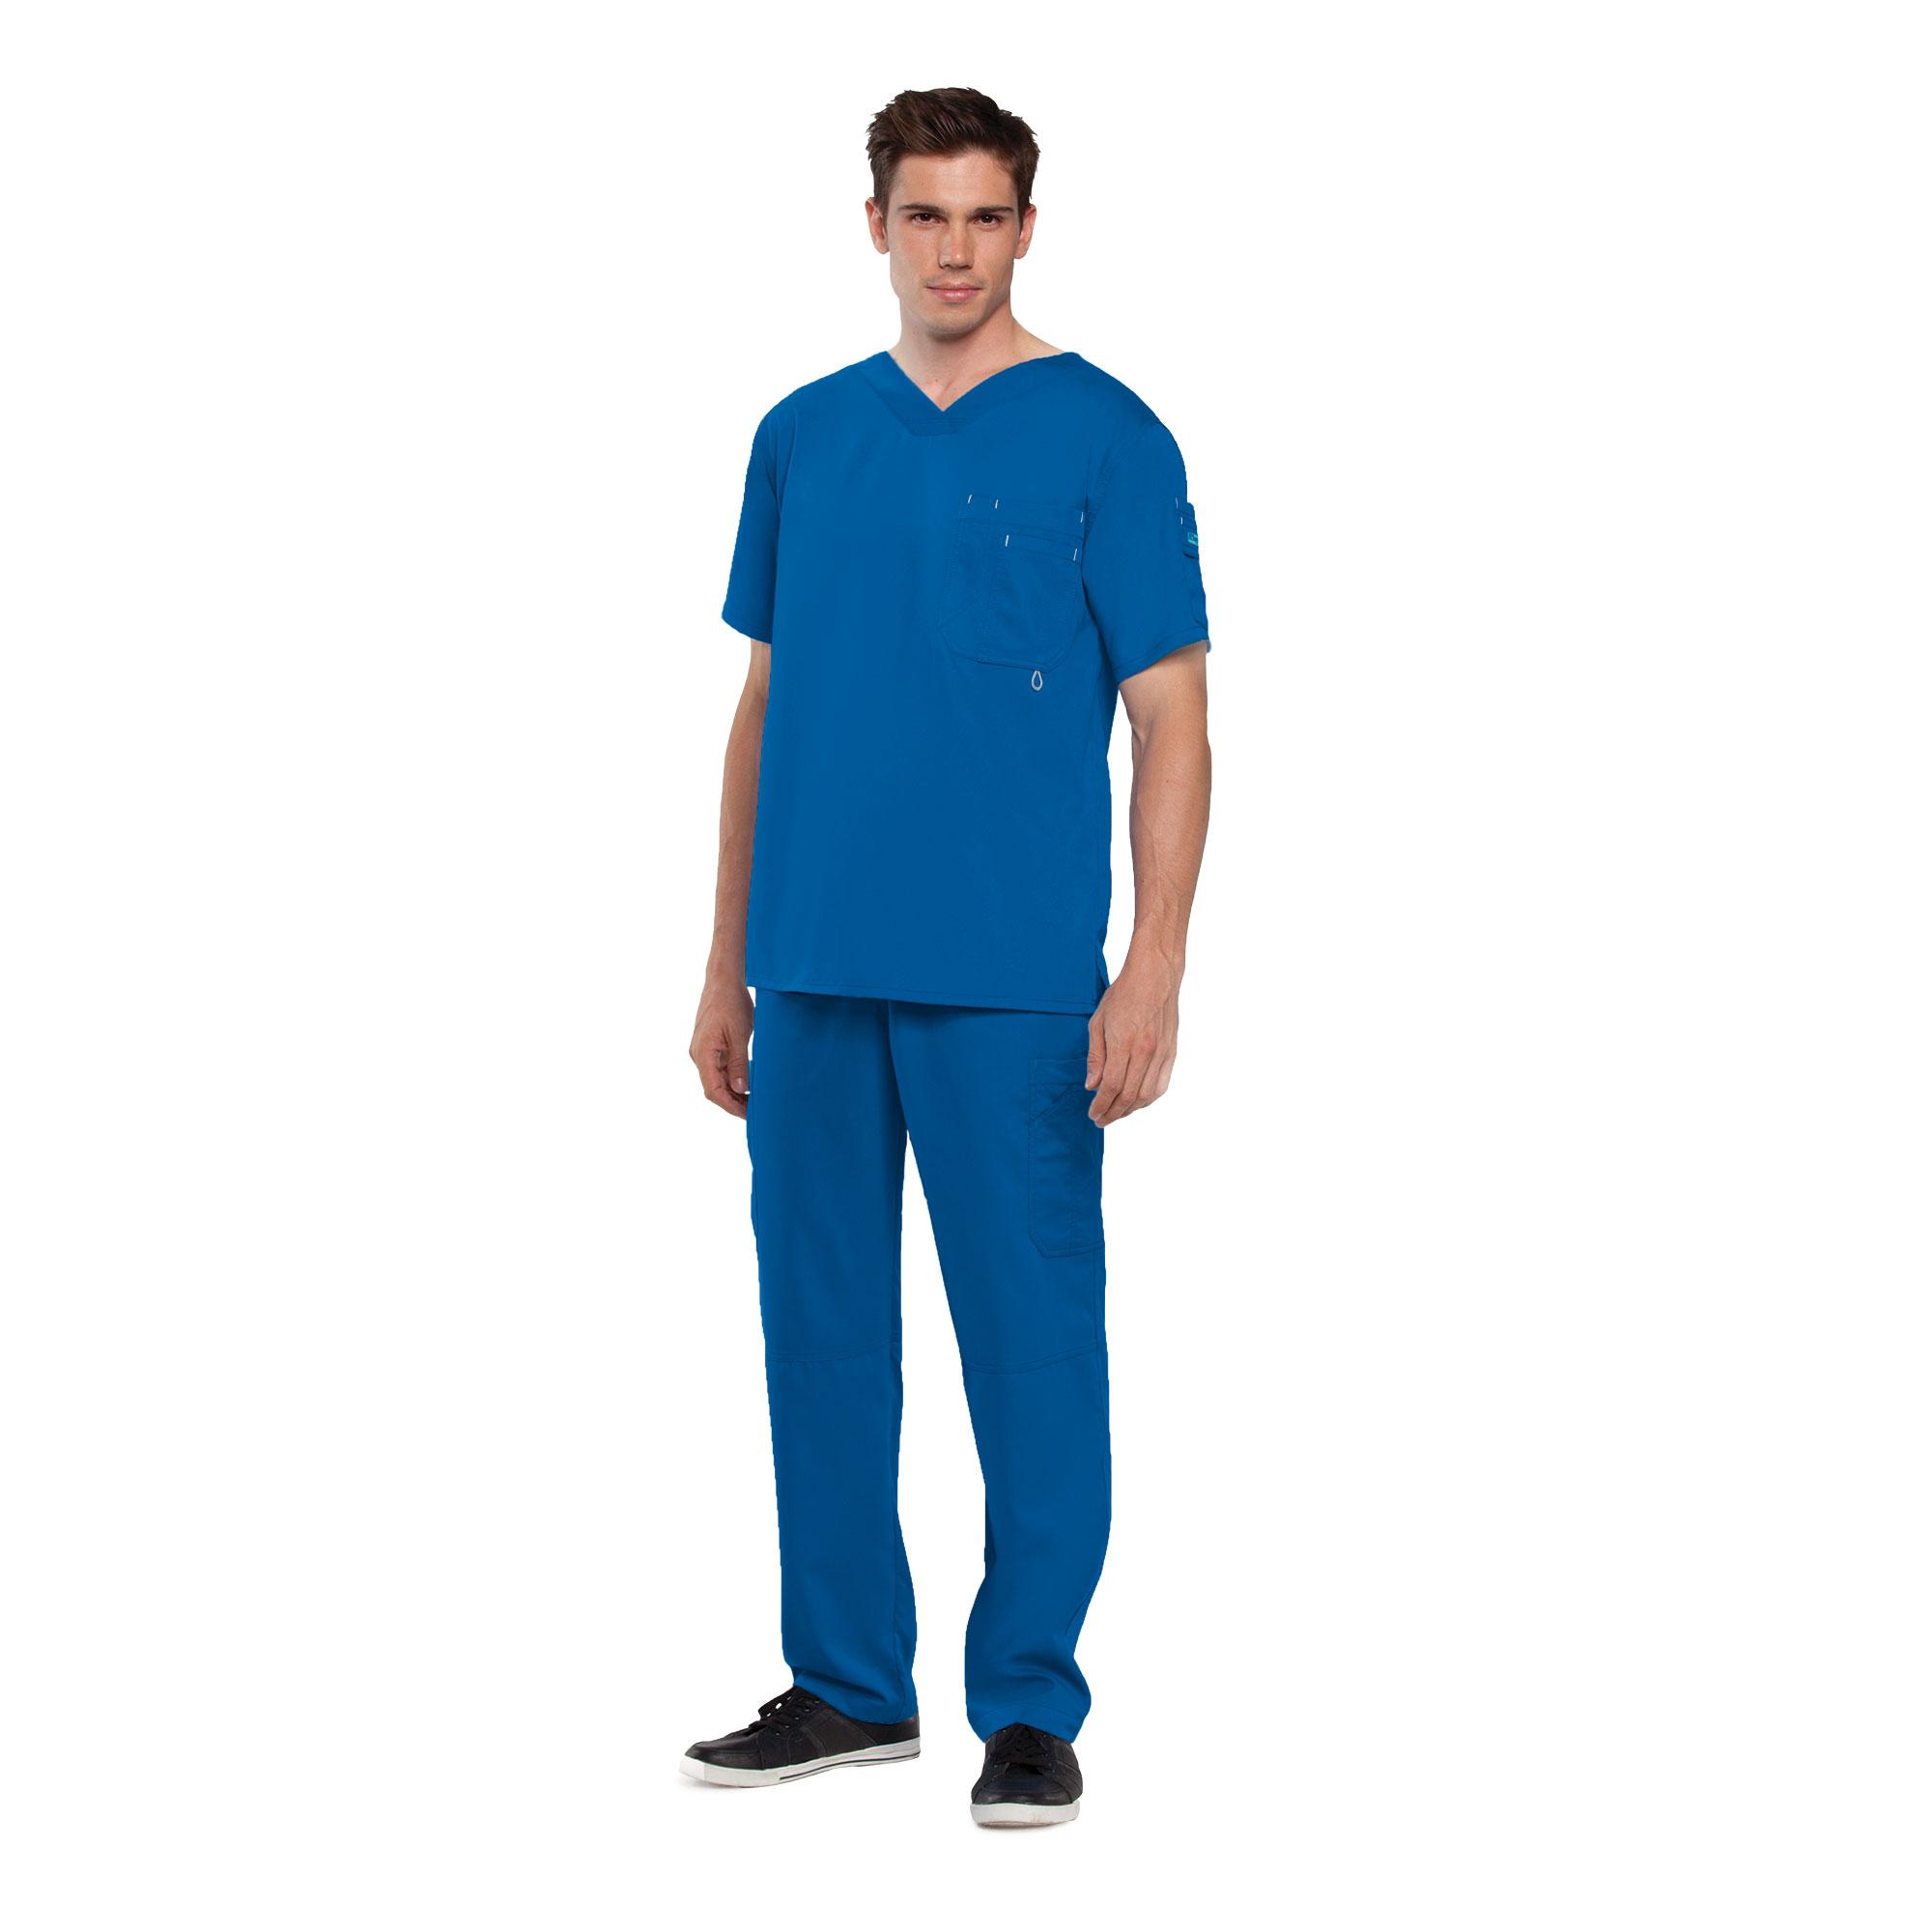 Buy 3 Pocket High Open V-Neck - Grey\'s Anatomy Online at Best price - IL